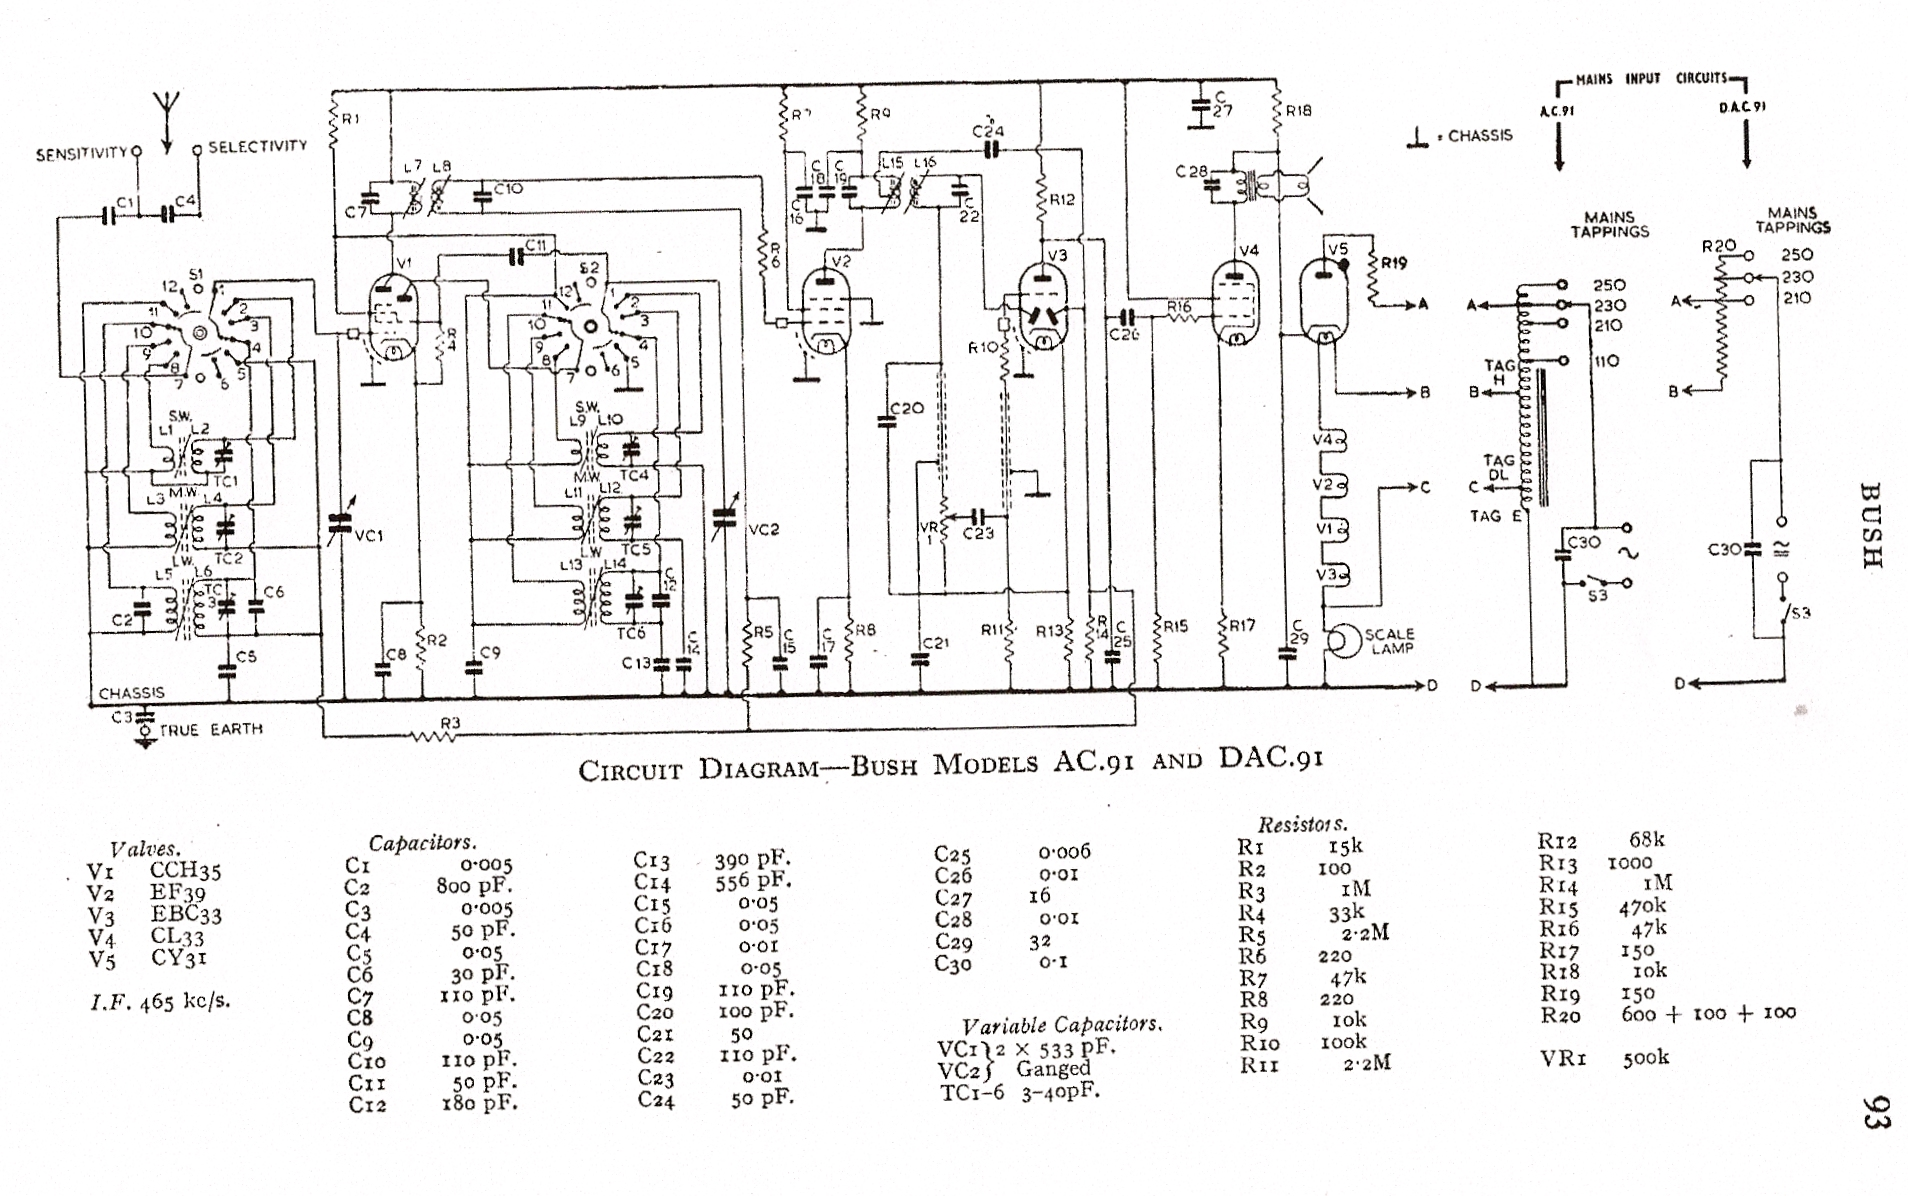 hight resolution of bush ac91 schematic